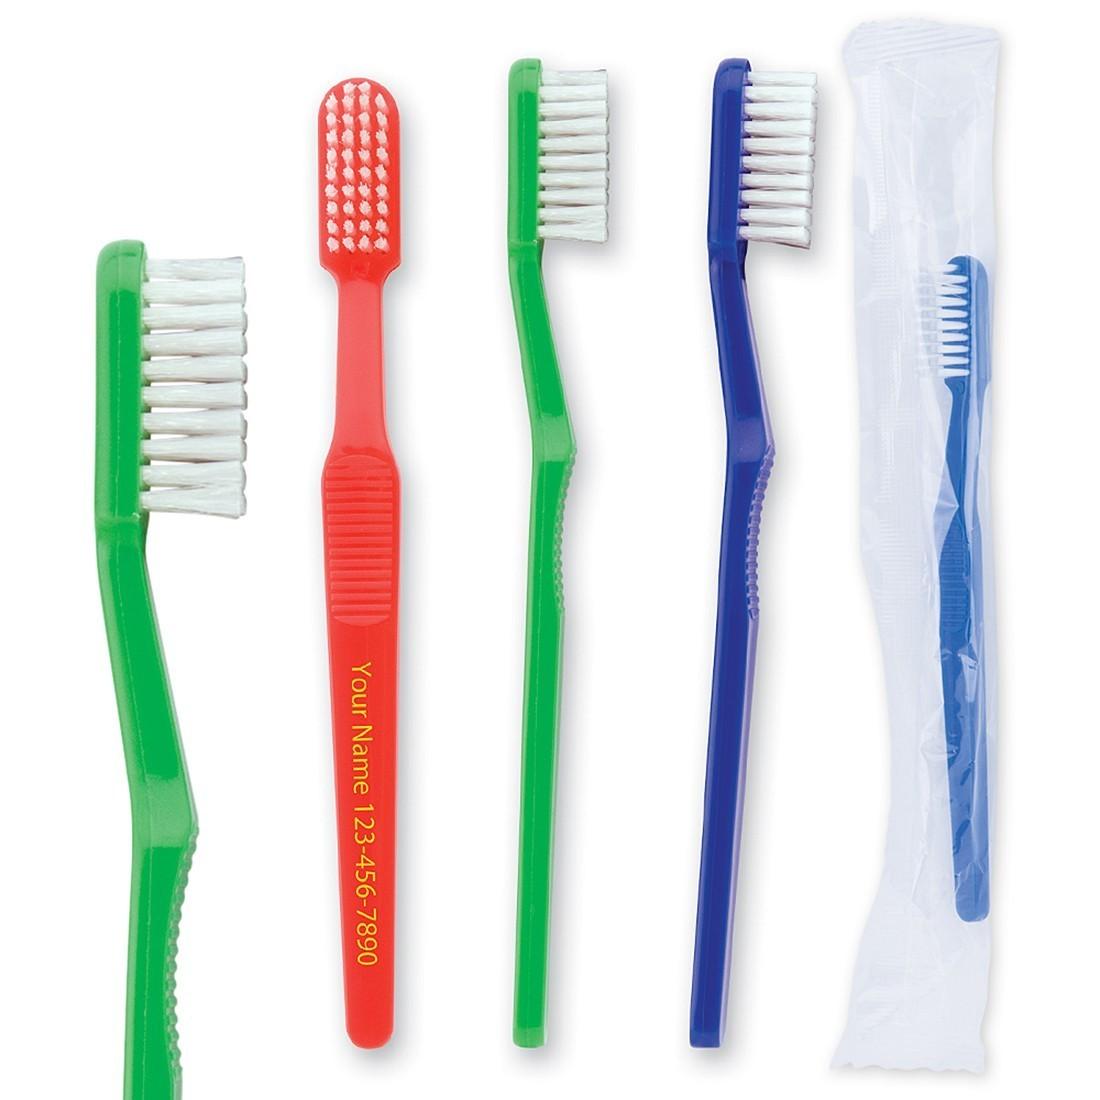 Custom SmileCare Adult Standard Toothbrush [image]